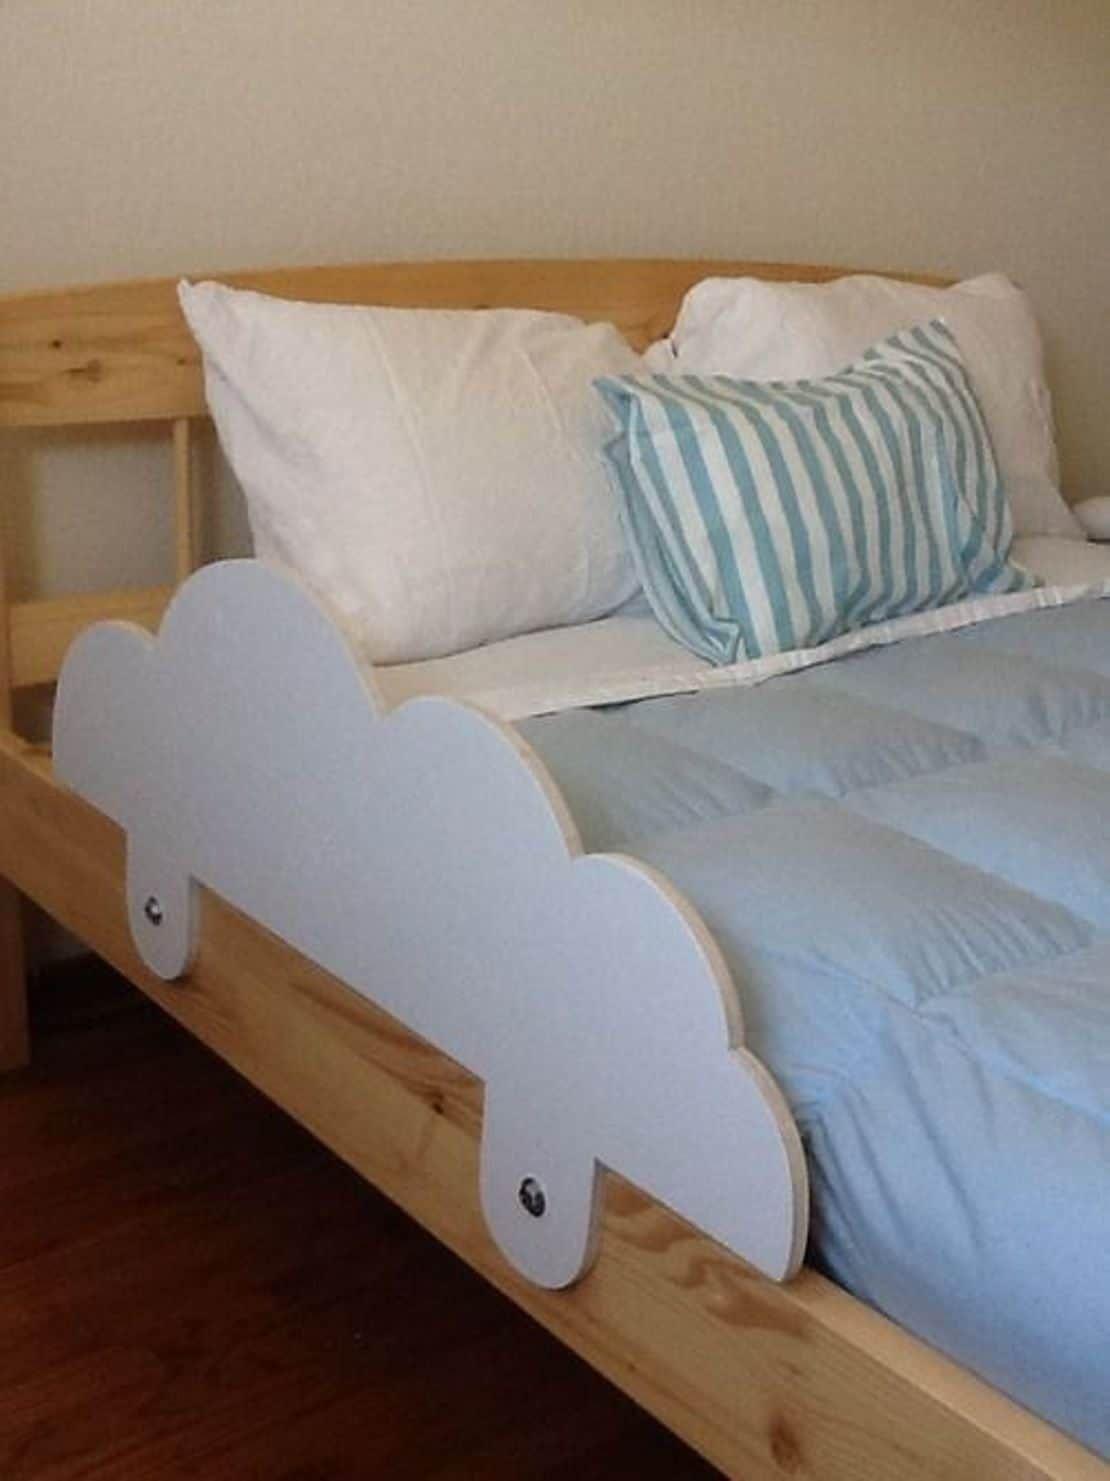 Functional Toddler Bed Rails In 2020 Diy Toddler Bed Bed Rails For Toddlers Toddler Bed Frame